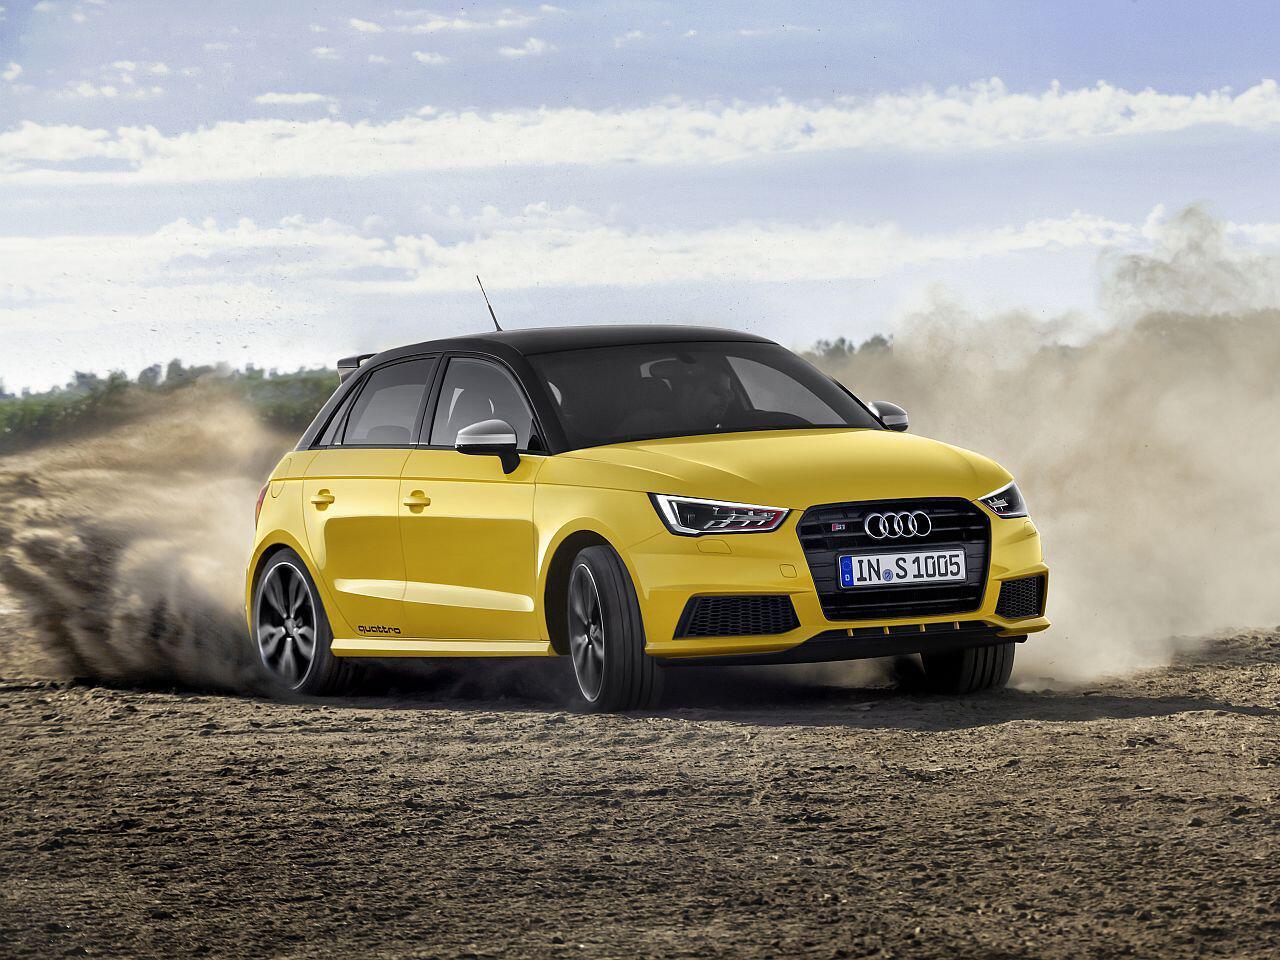 Bild zu 13. Platz: Audi S1